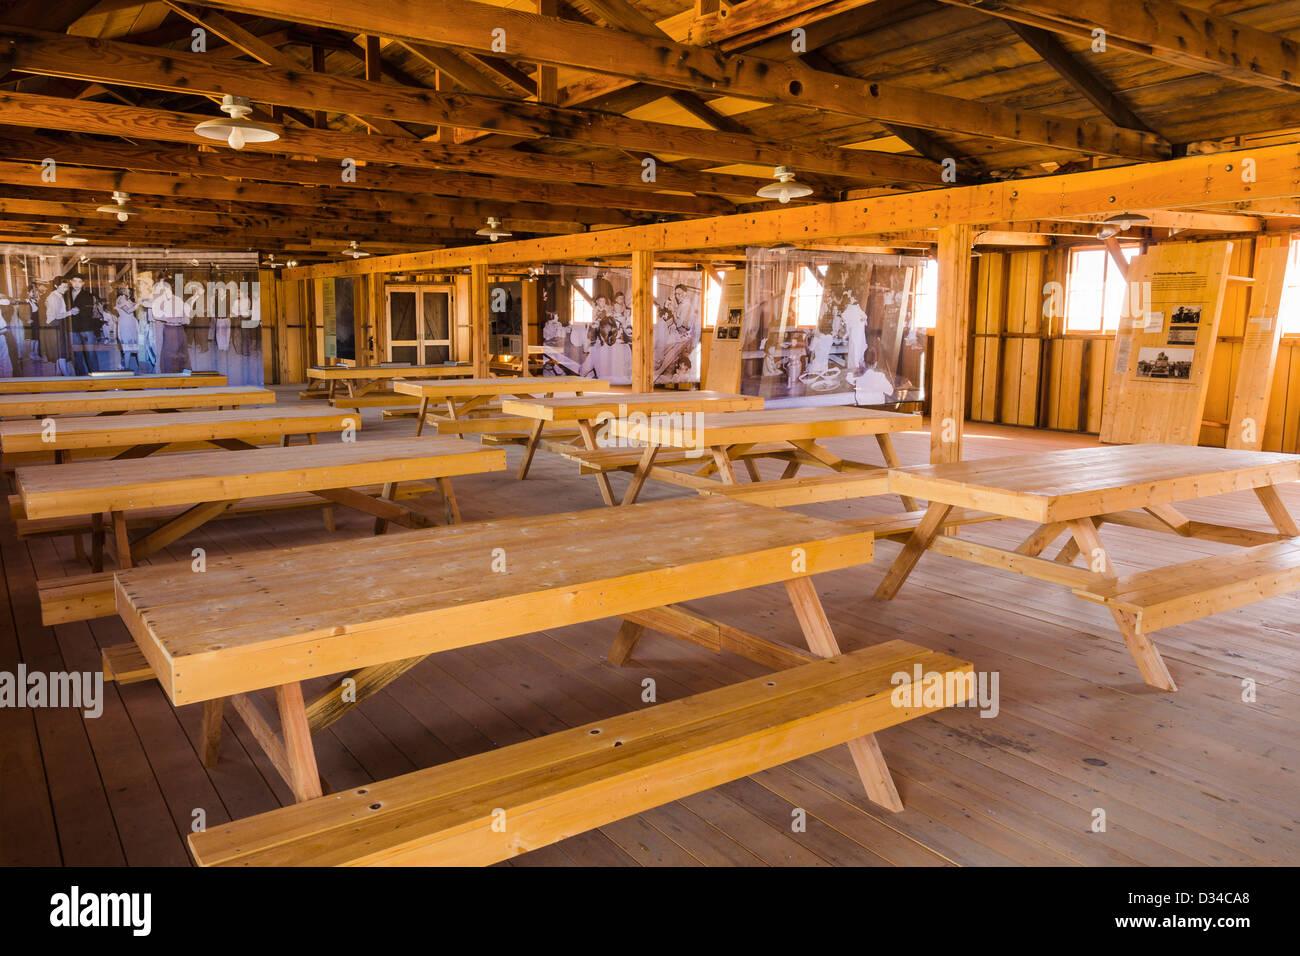 Mess hall interior at Manzanar National Historic Site, Lone Pine, California USA - Stock Image